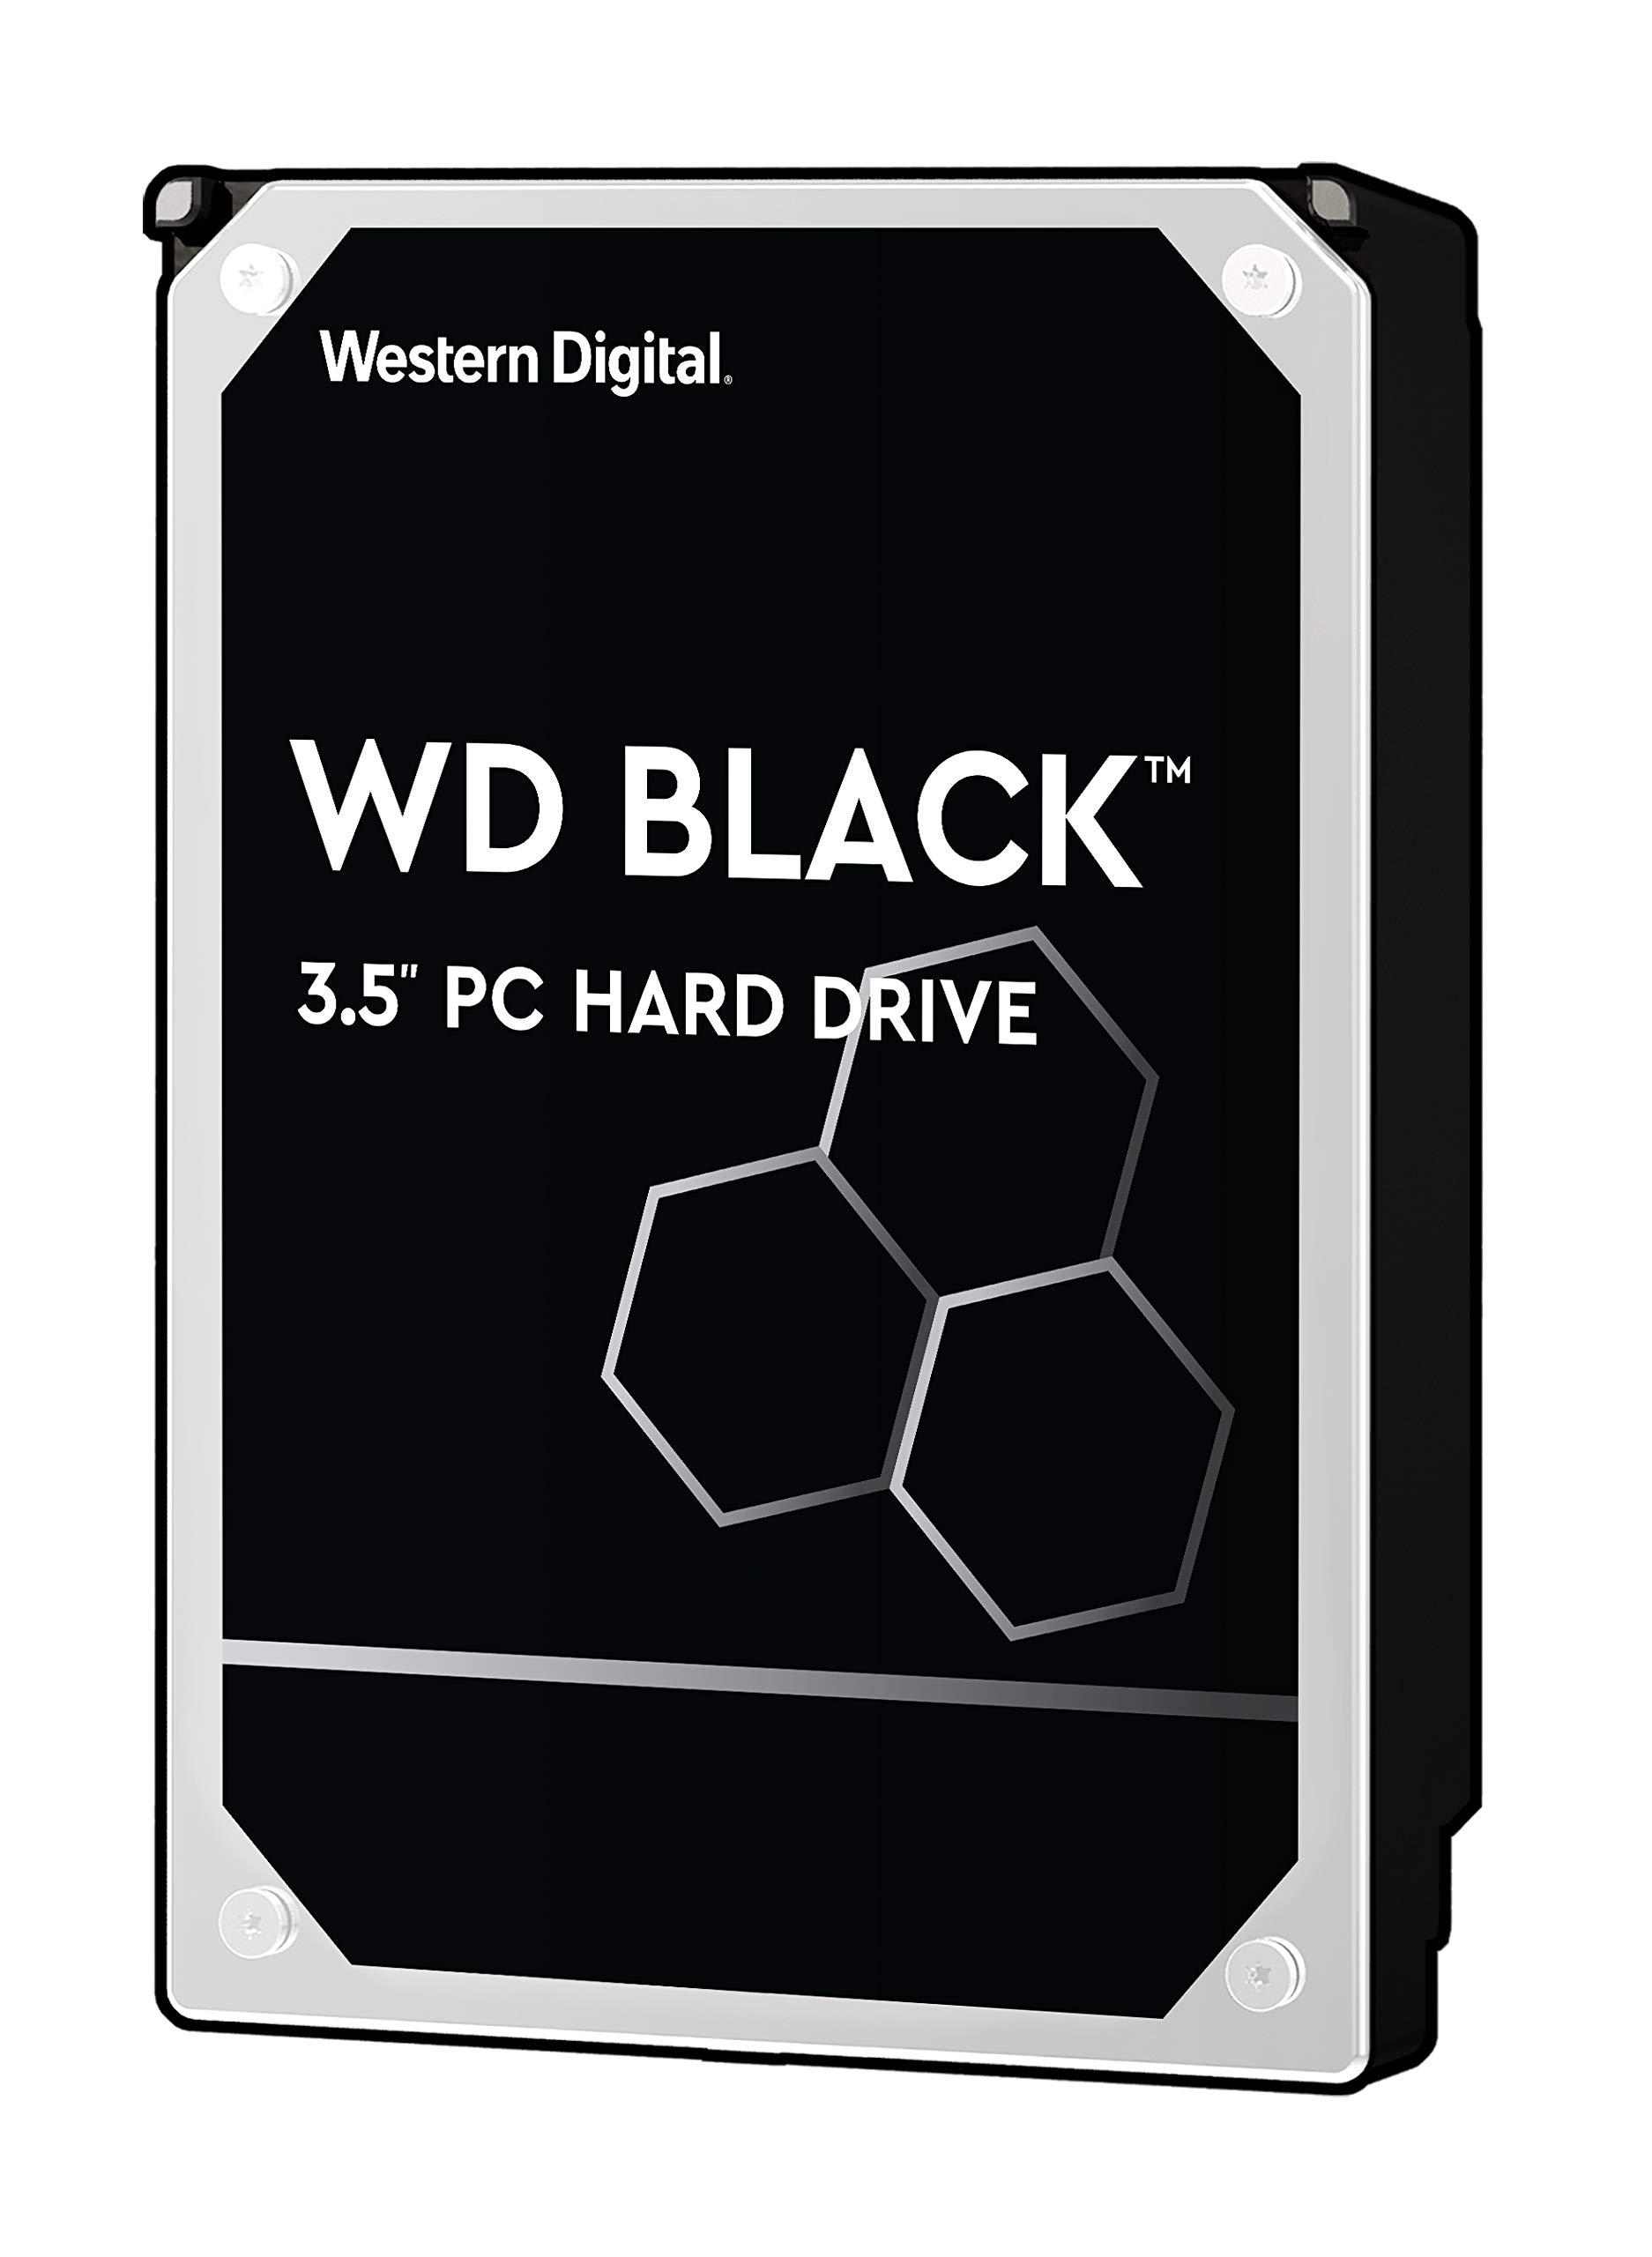 Western Digital 1TB BlackInternal Desktop Hard Drive (Western Digital1003FZEX) product image